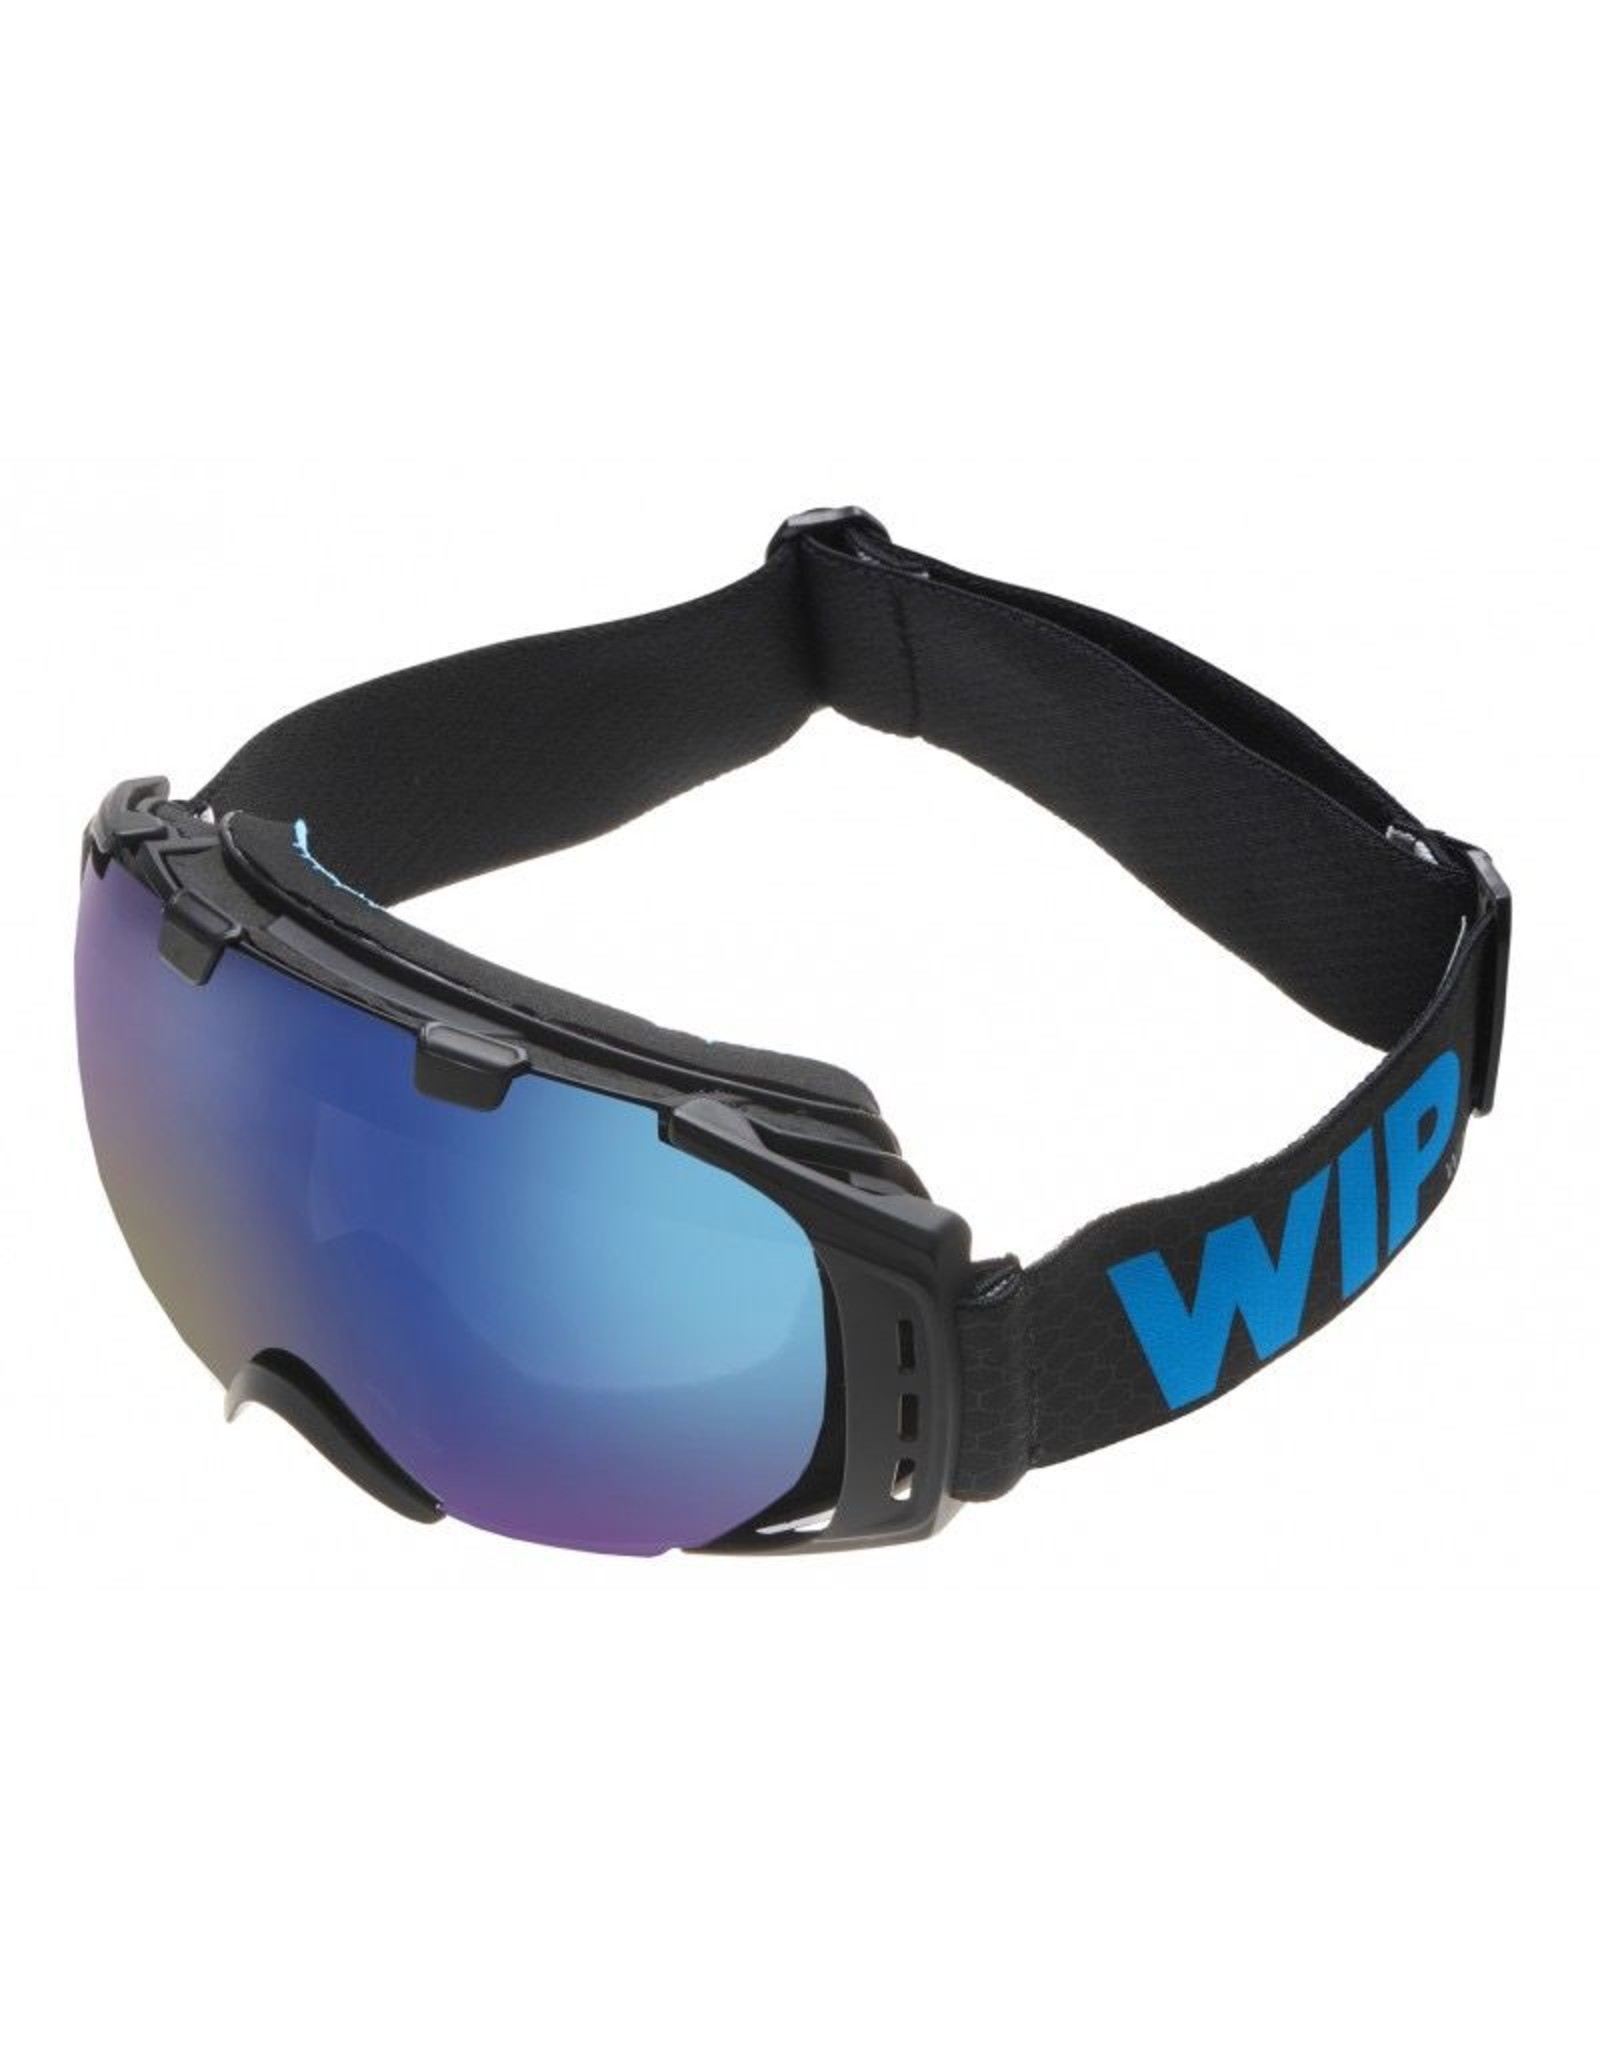 ForwardWIP ForwardWIP - Flying mask sail goggle